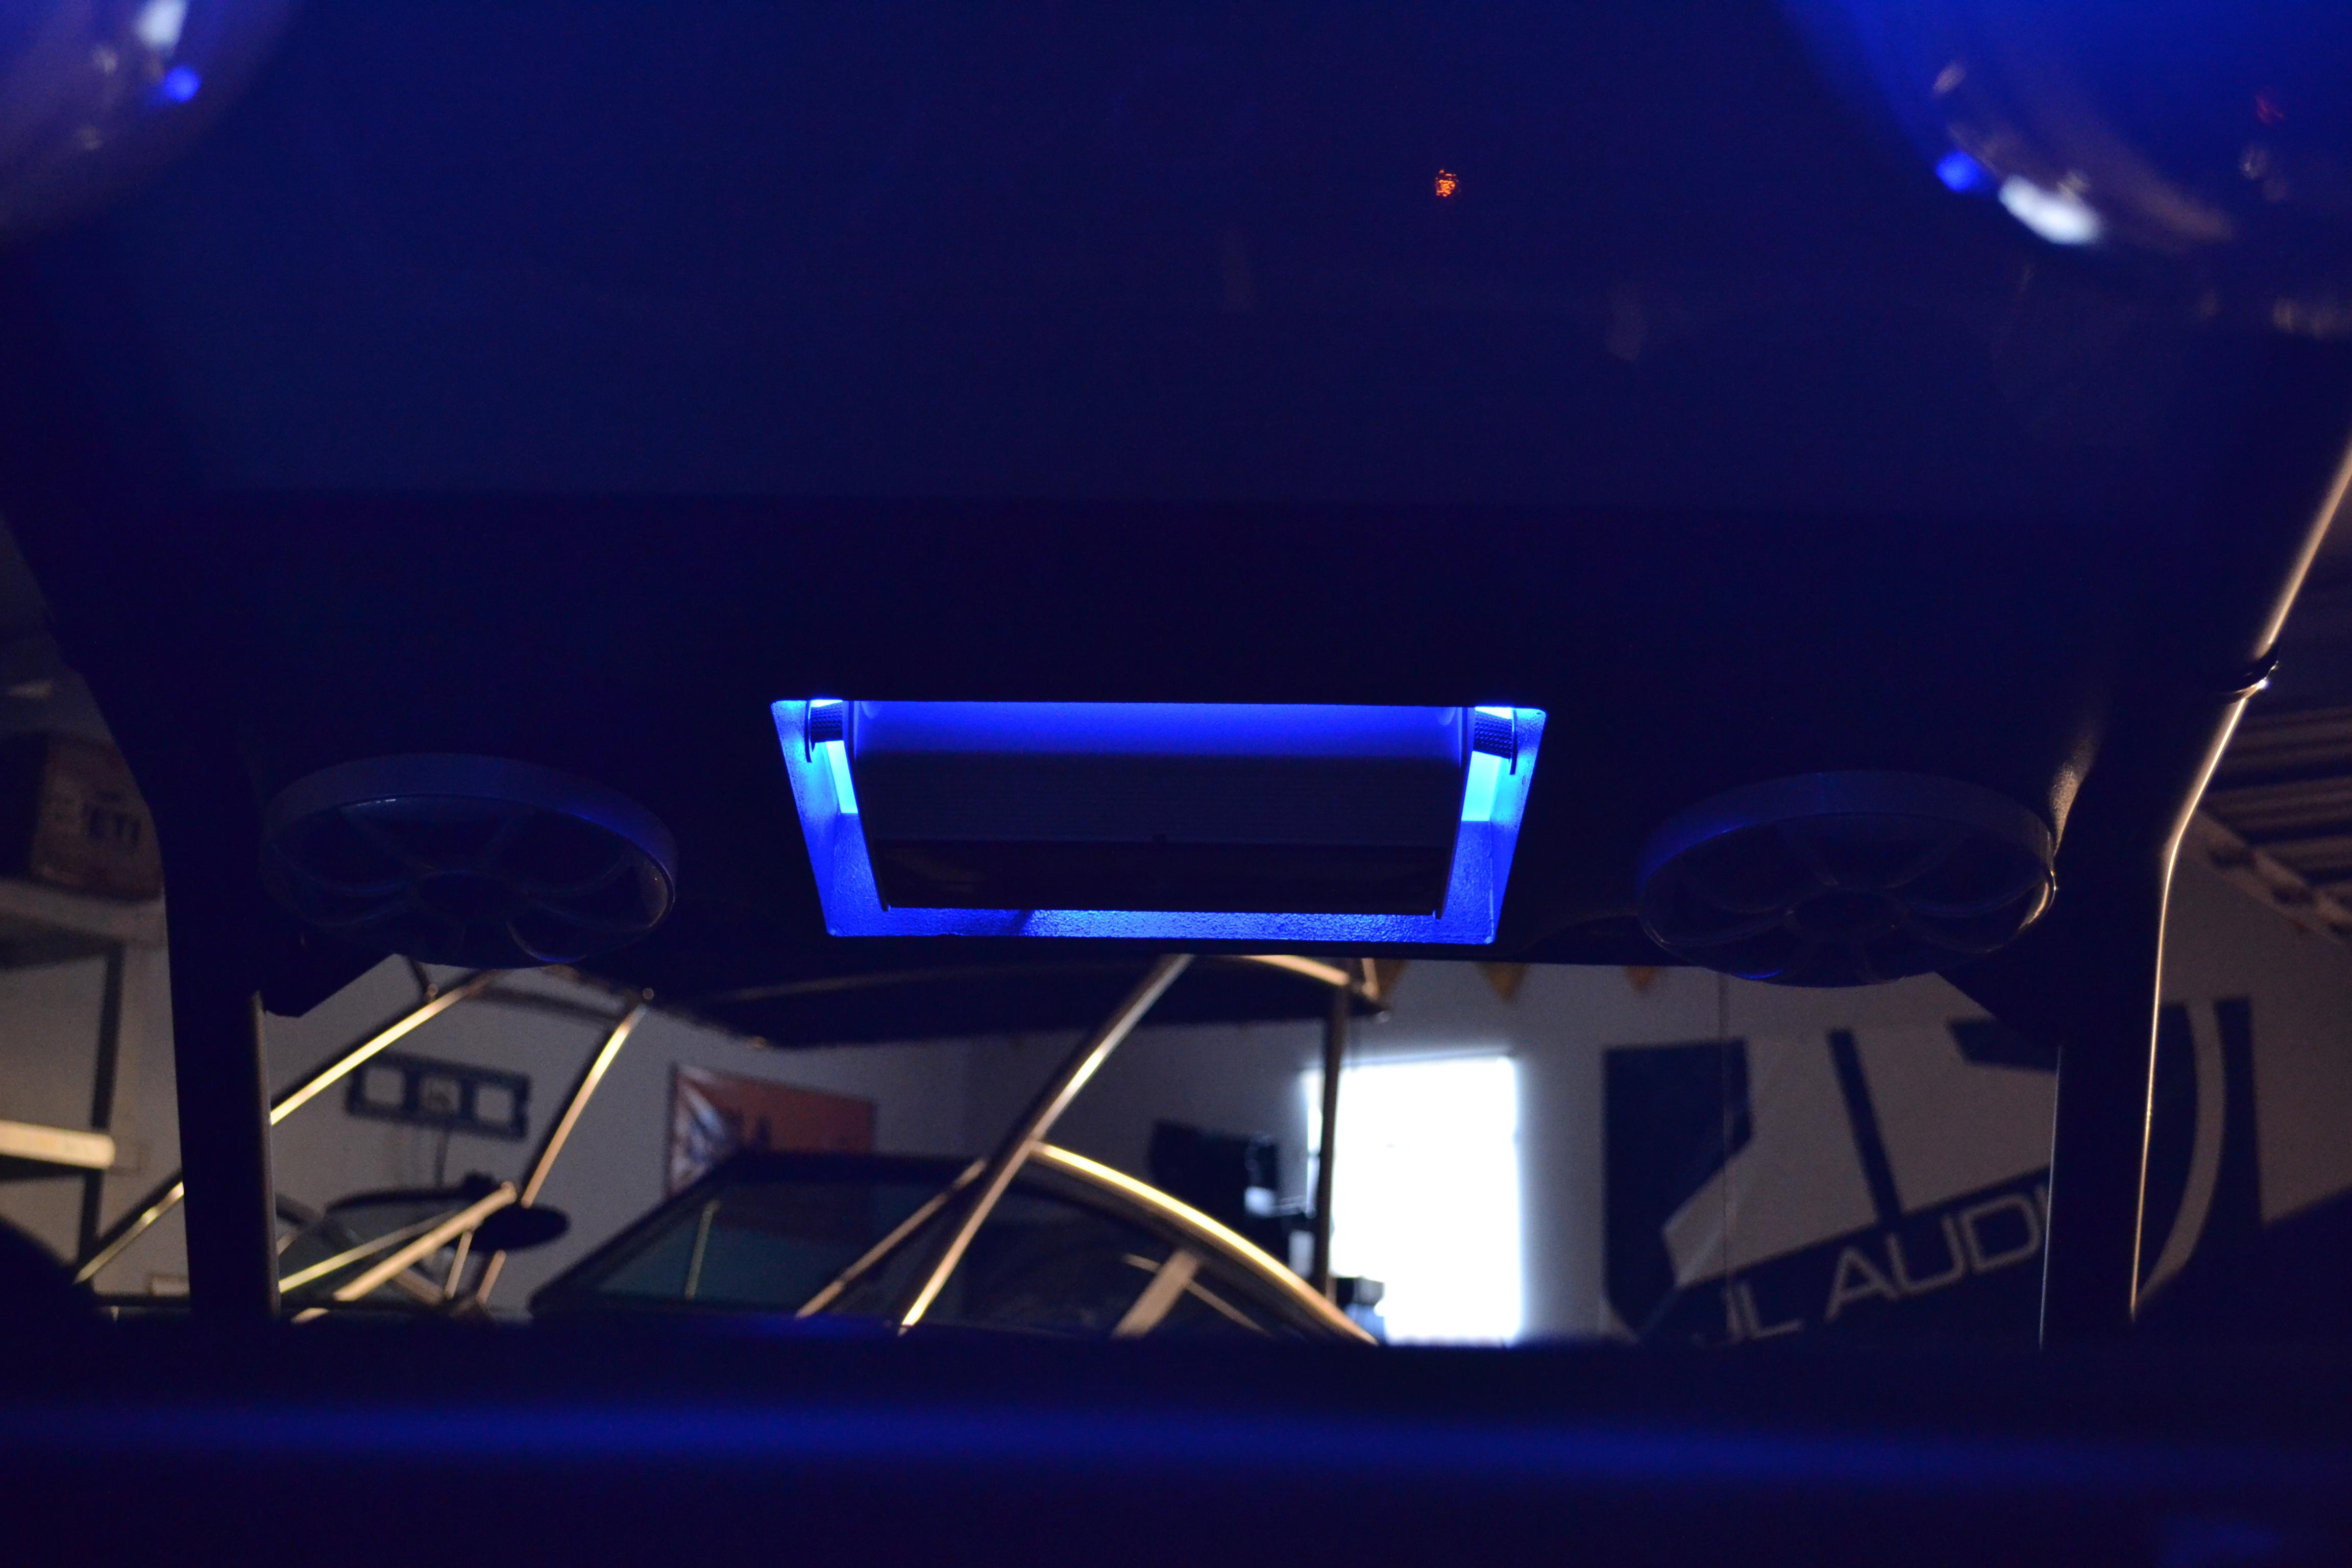 2014 Polaris RZR 1000 Wet Sounds REV8 XS65i JL Audio M series amplifier powered volume control knob custom speaker amp pod across roof RGB LED rings RGB LED accent overhead